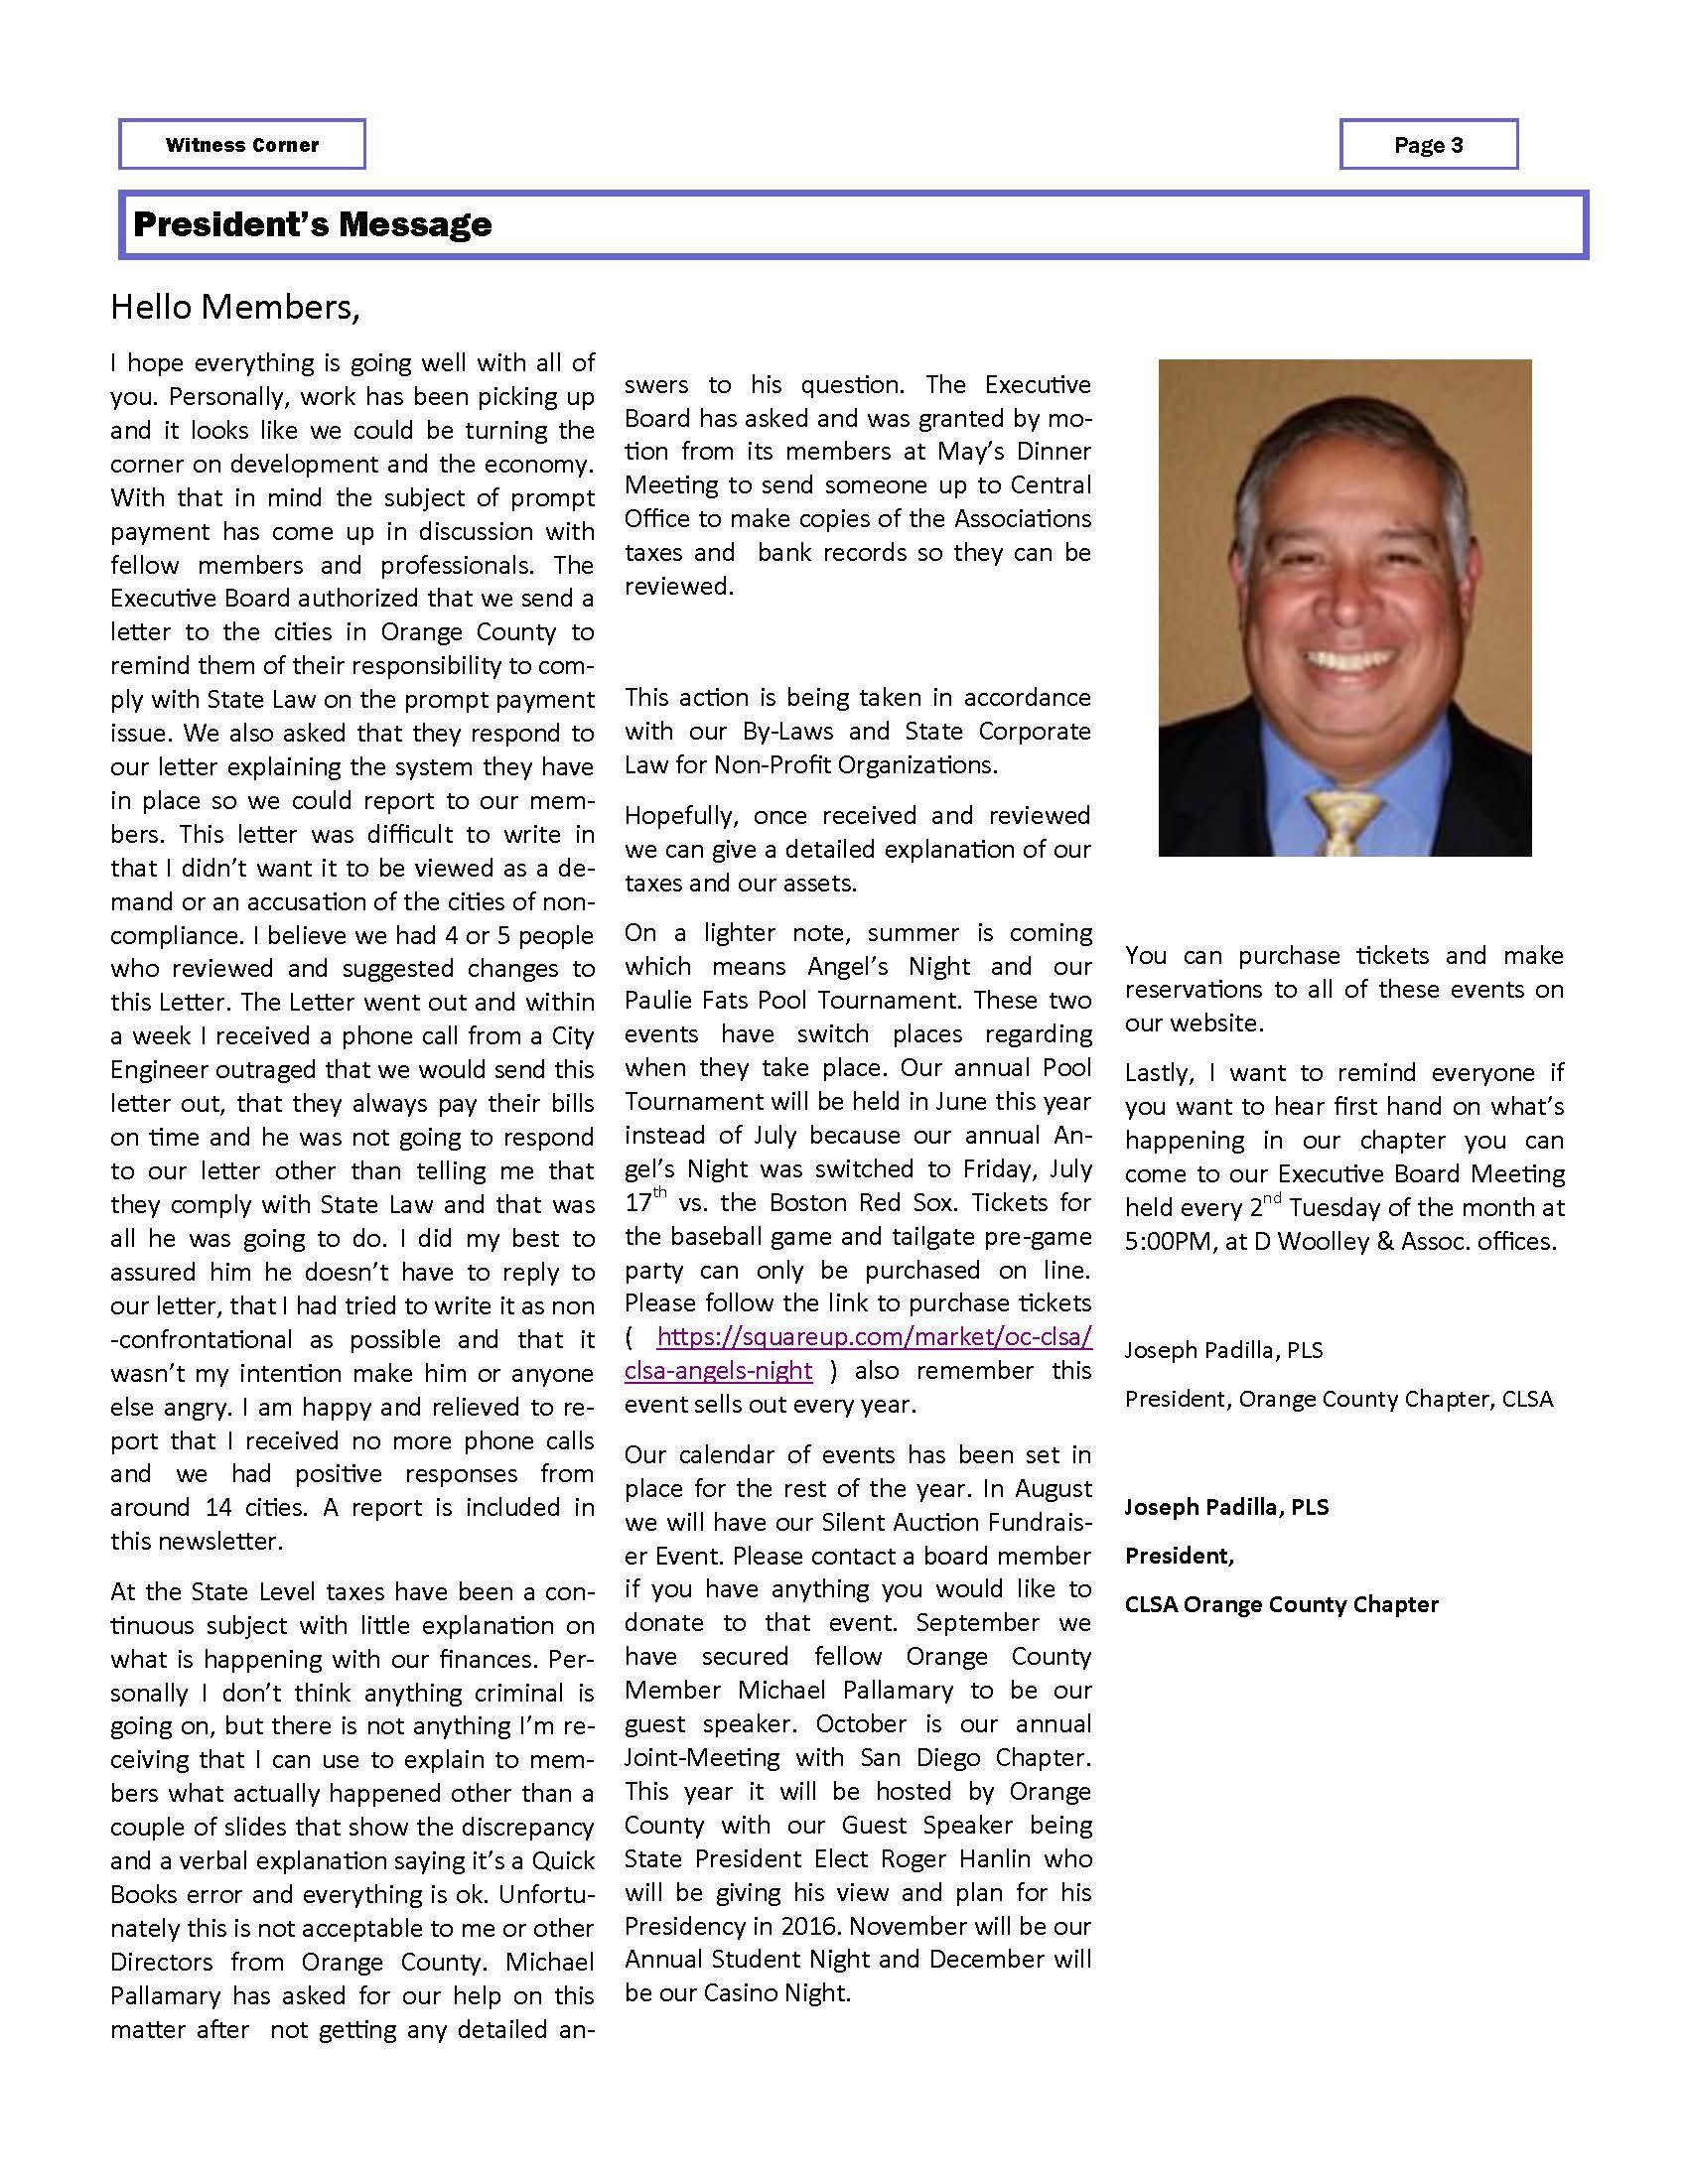 OC-CLSA 082015 Newsletter_Page_04.jpg